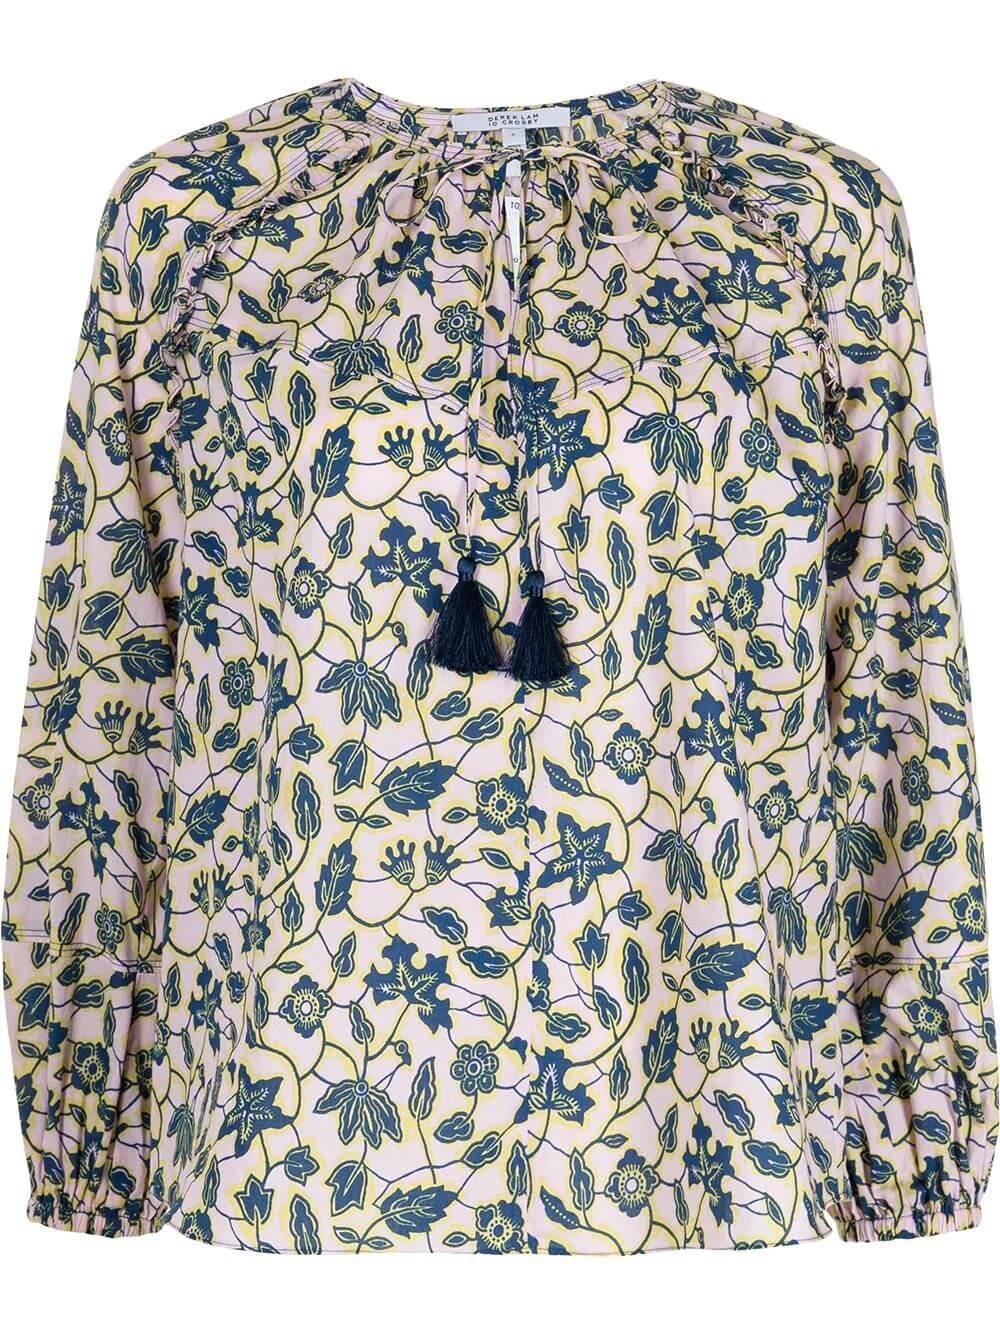 Devon Floral Blouse Item # TS11714IK